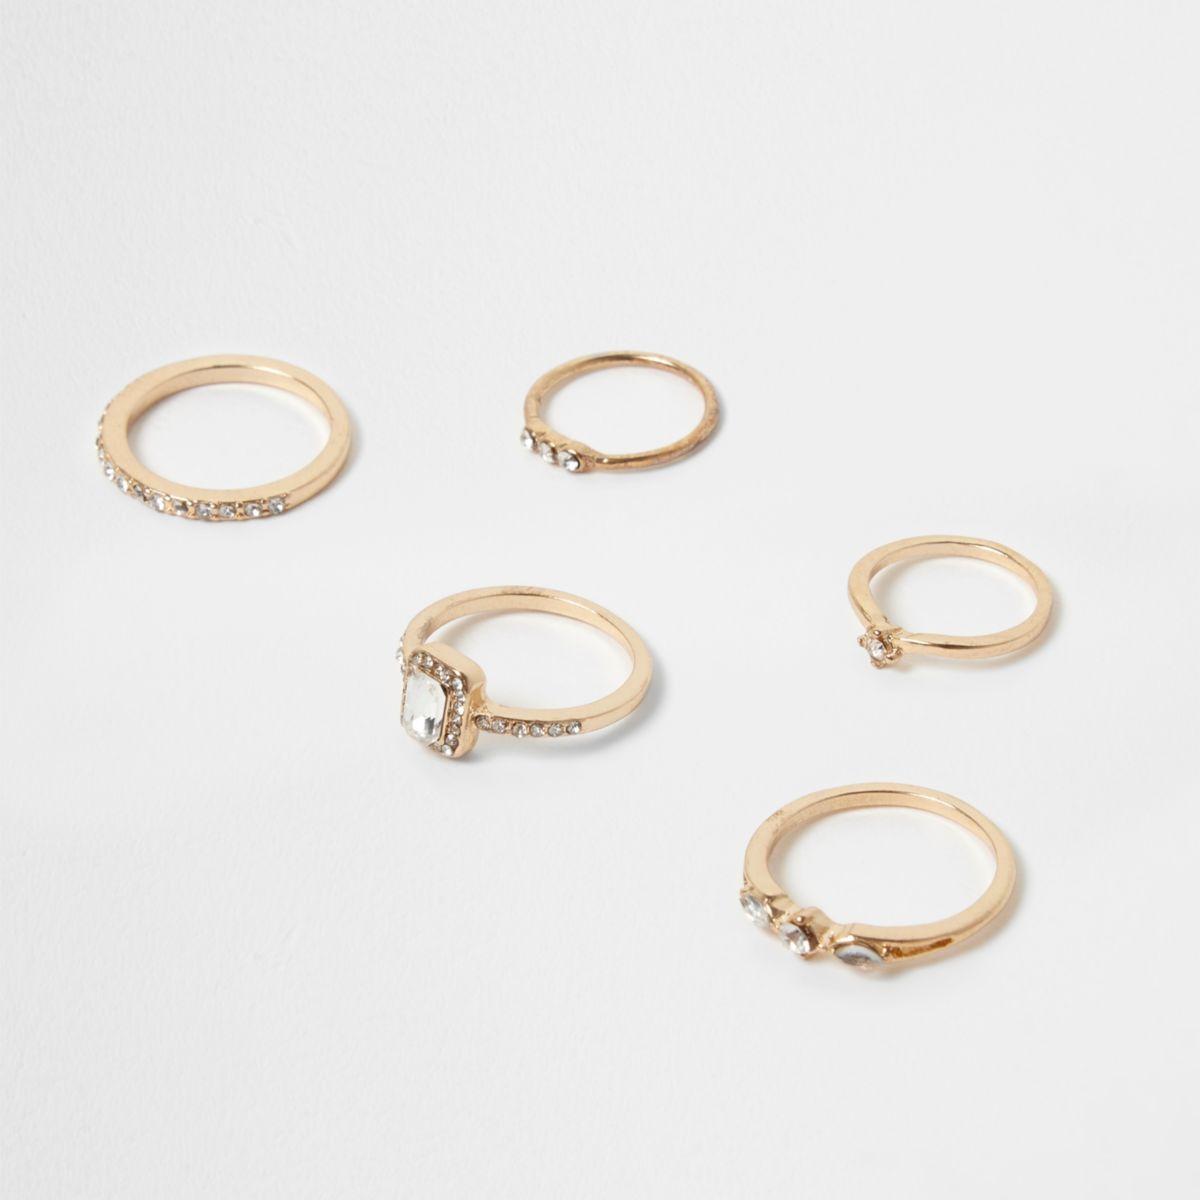 Gold tone rhinestone ring set